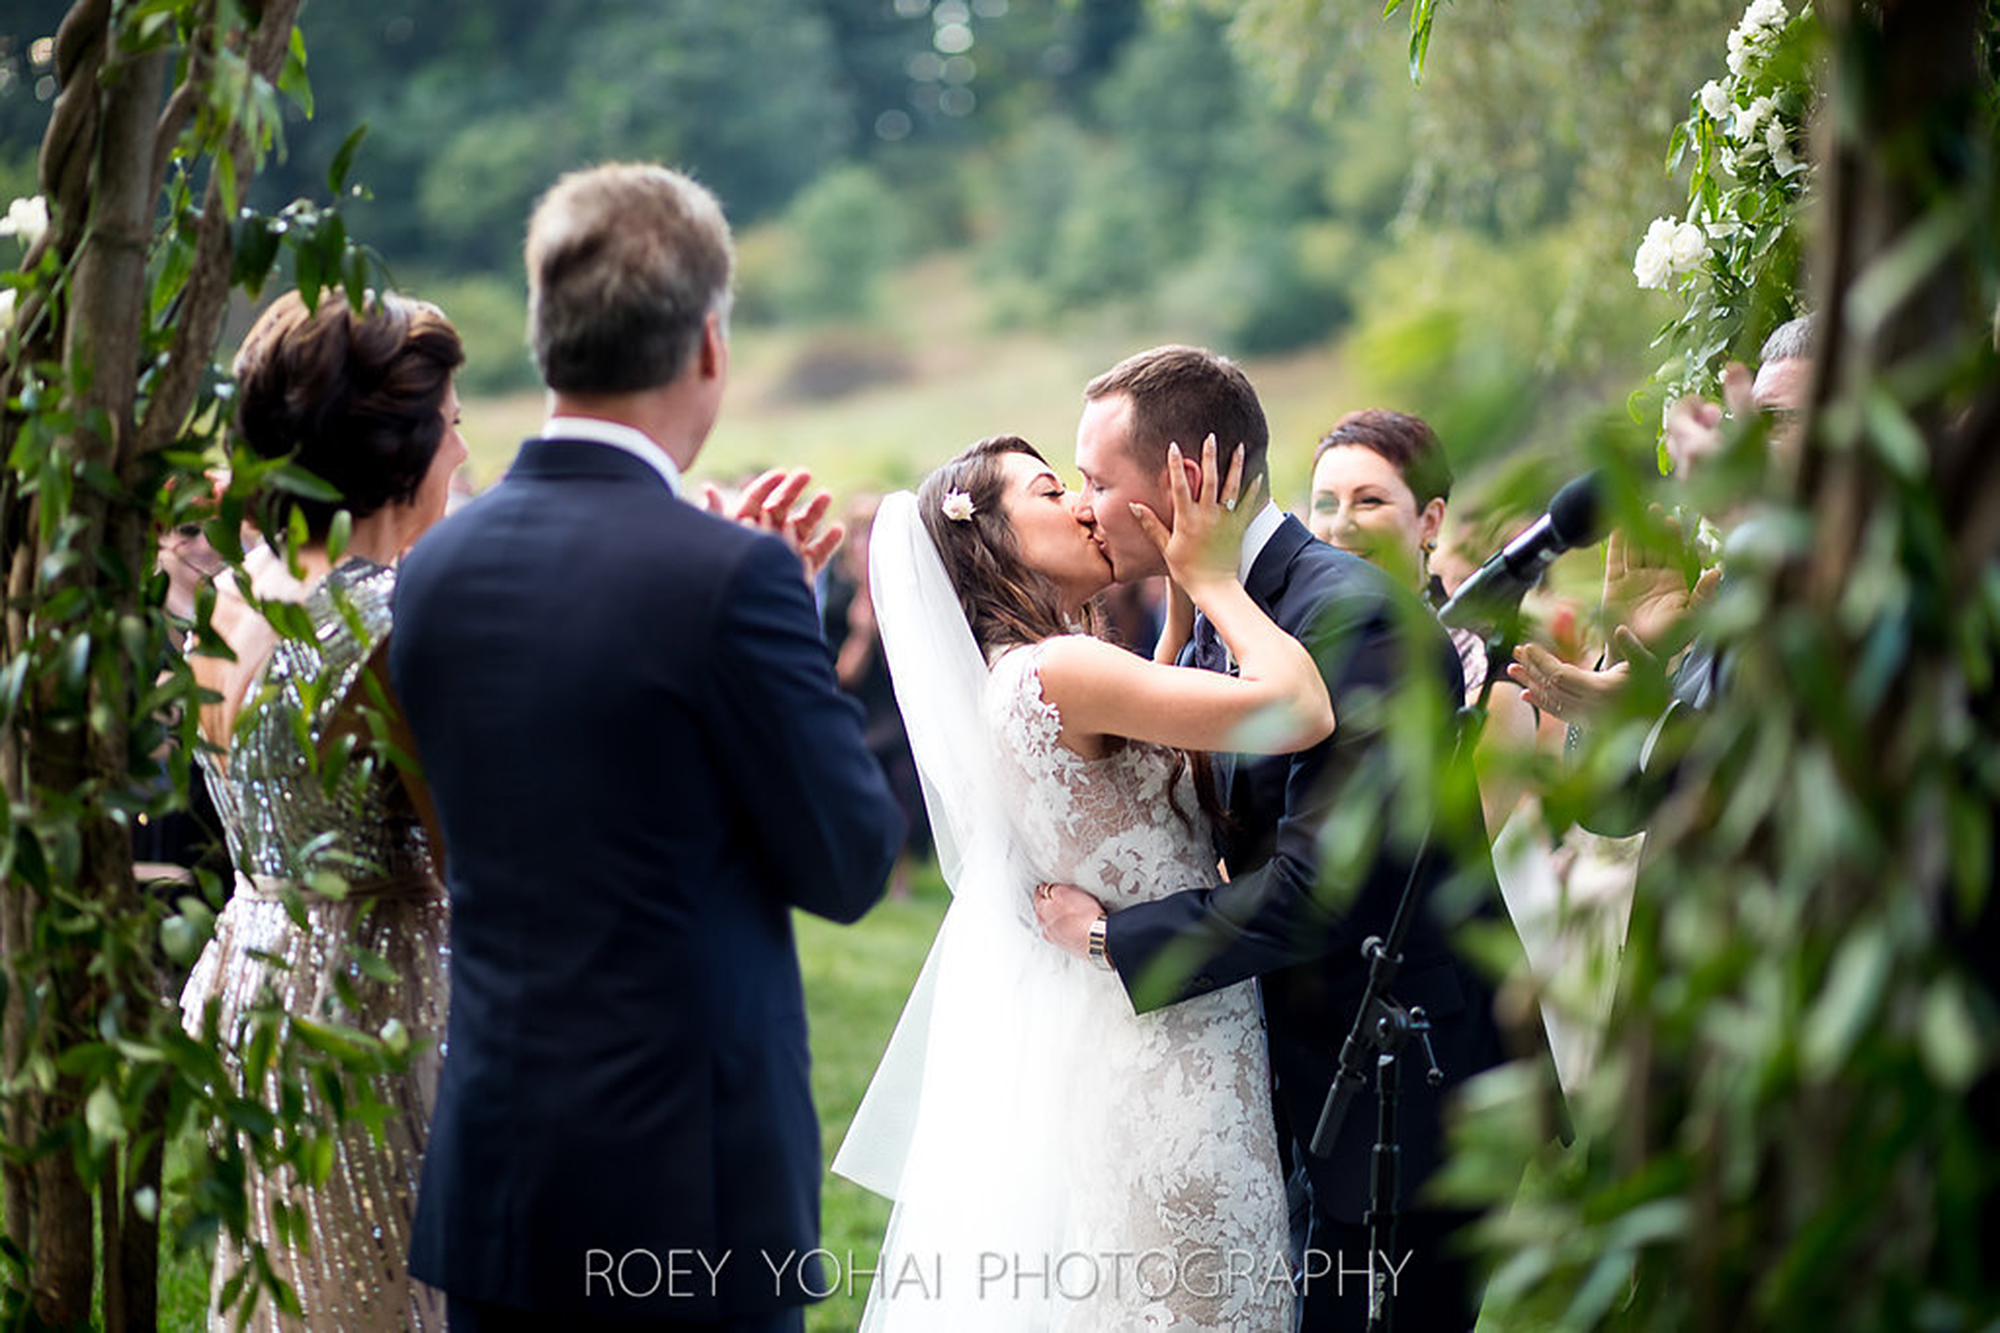 005_Garden Wedding Kiss Married_AE Events.jpeg.jpg